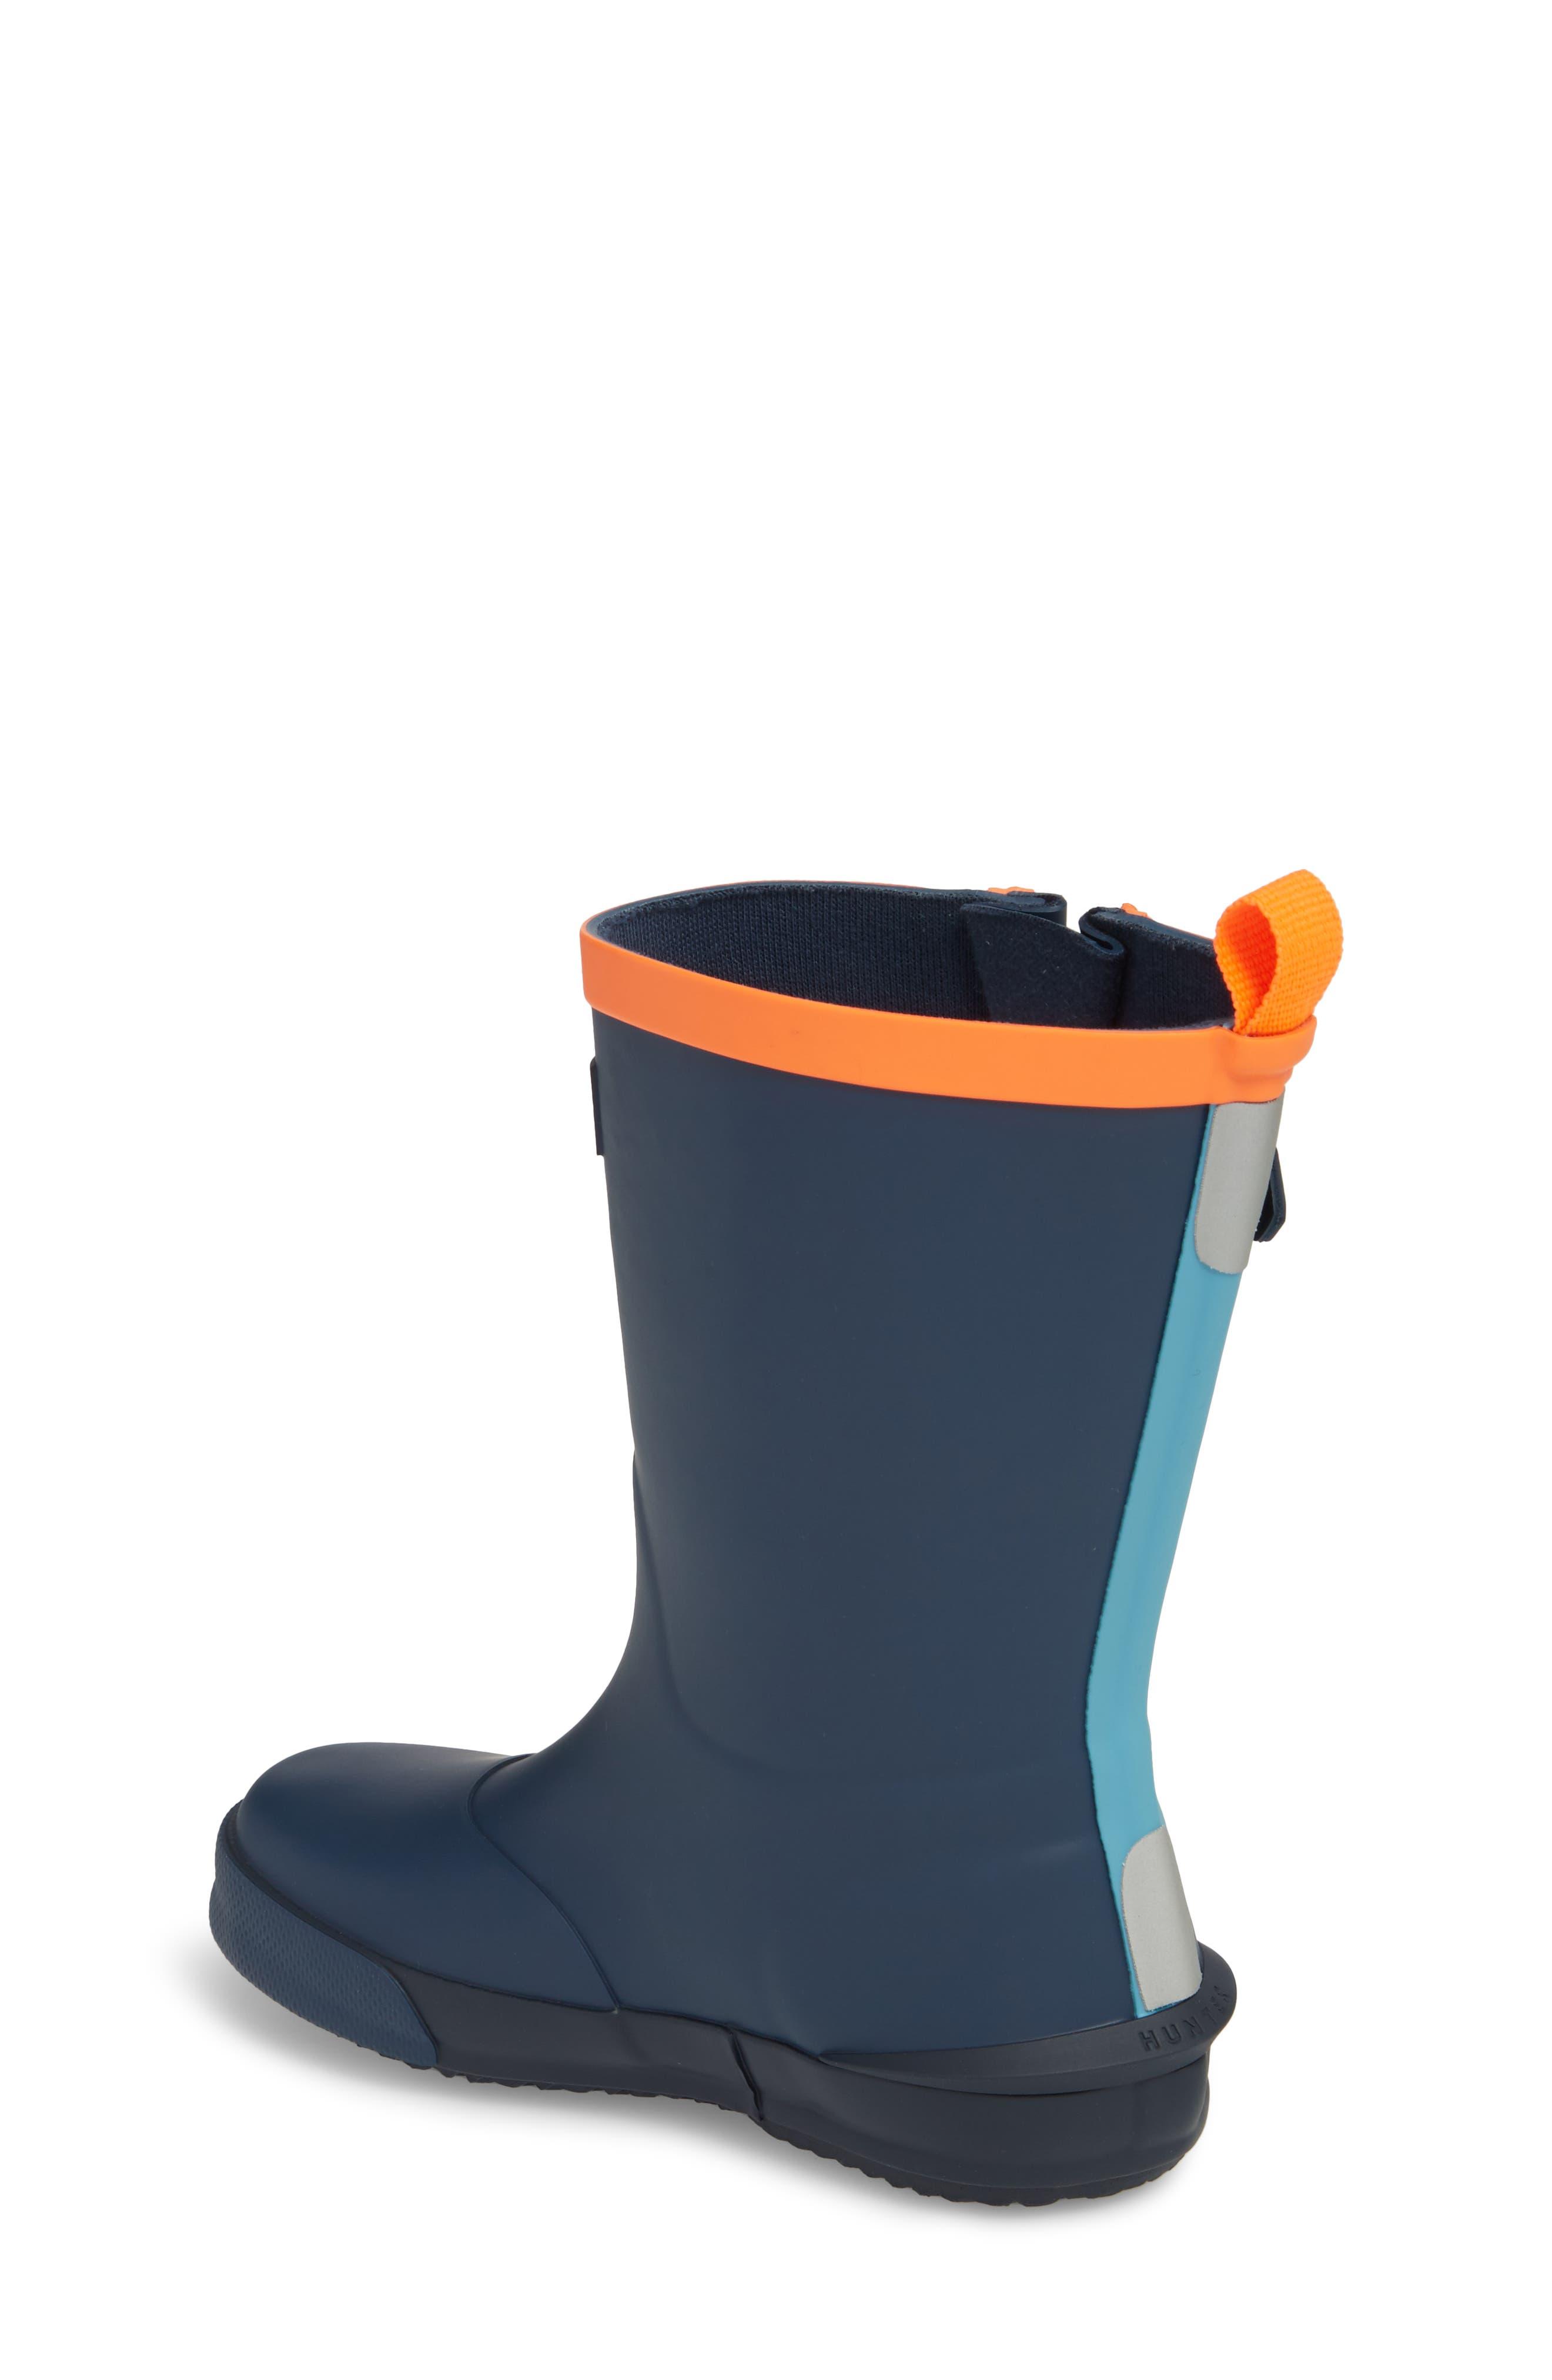 'Davison' Rain Boot,                             Alternate thumbnail 2, color,                             Dark Lake Blue/ Navy/ Hazard